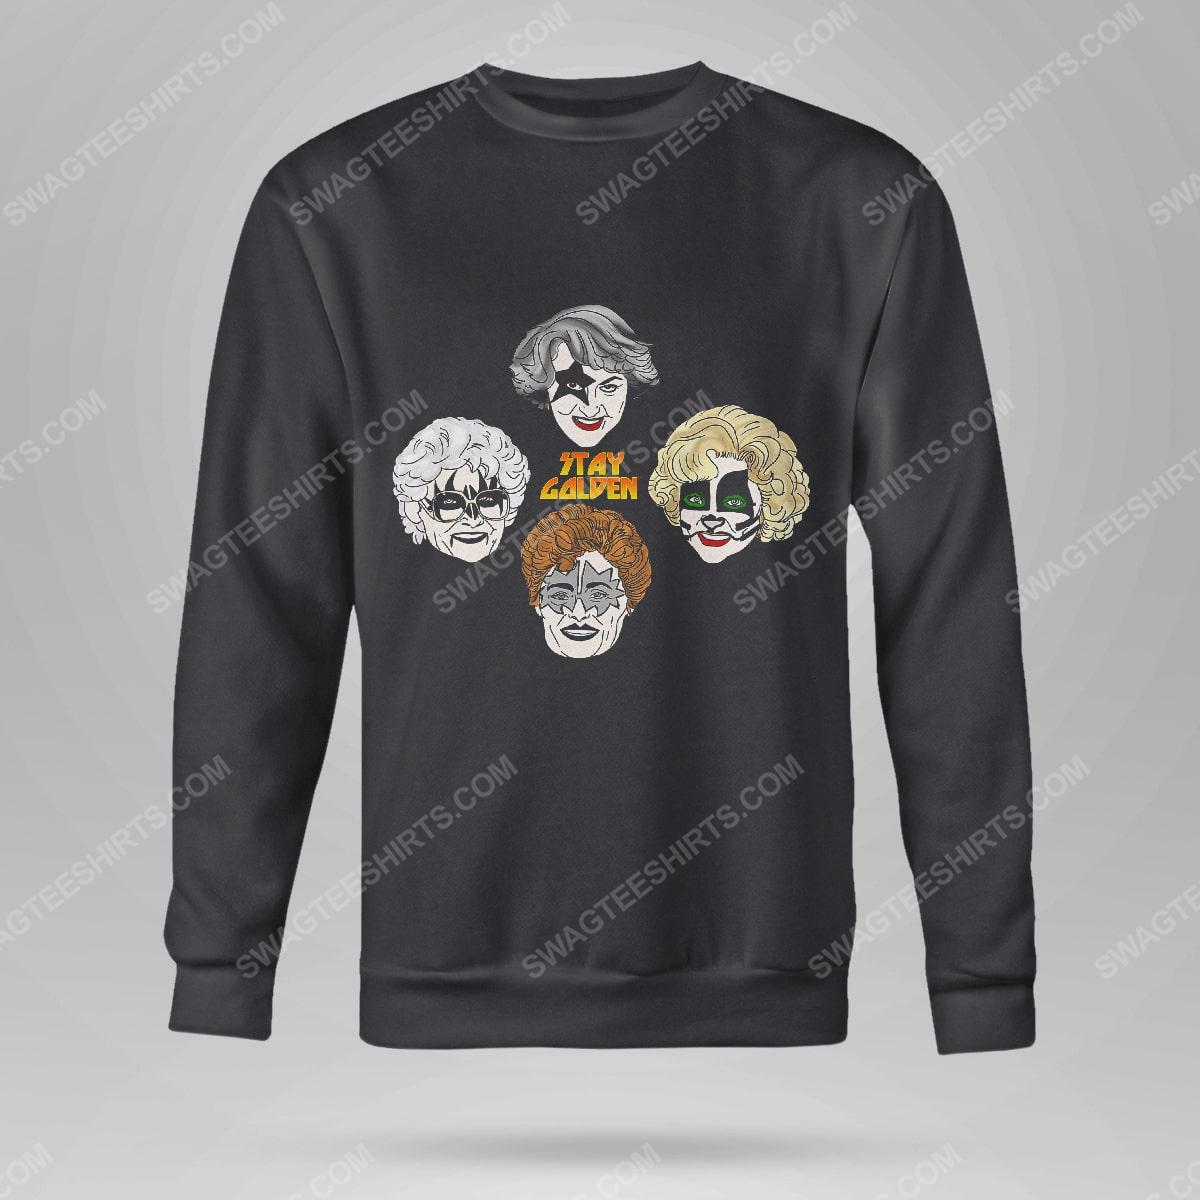 Kiss and the golden girls stay golden sweatshirt(1)